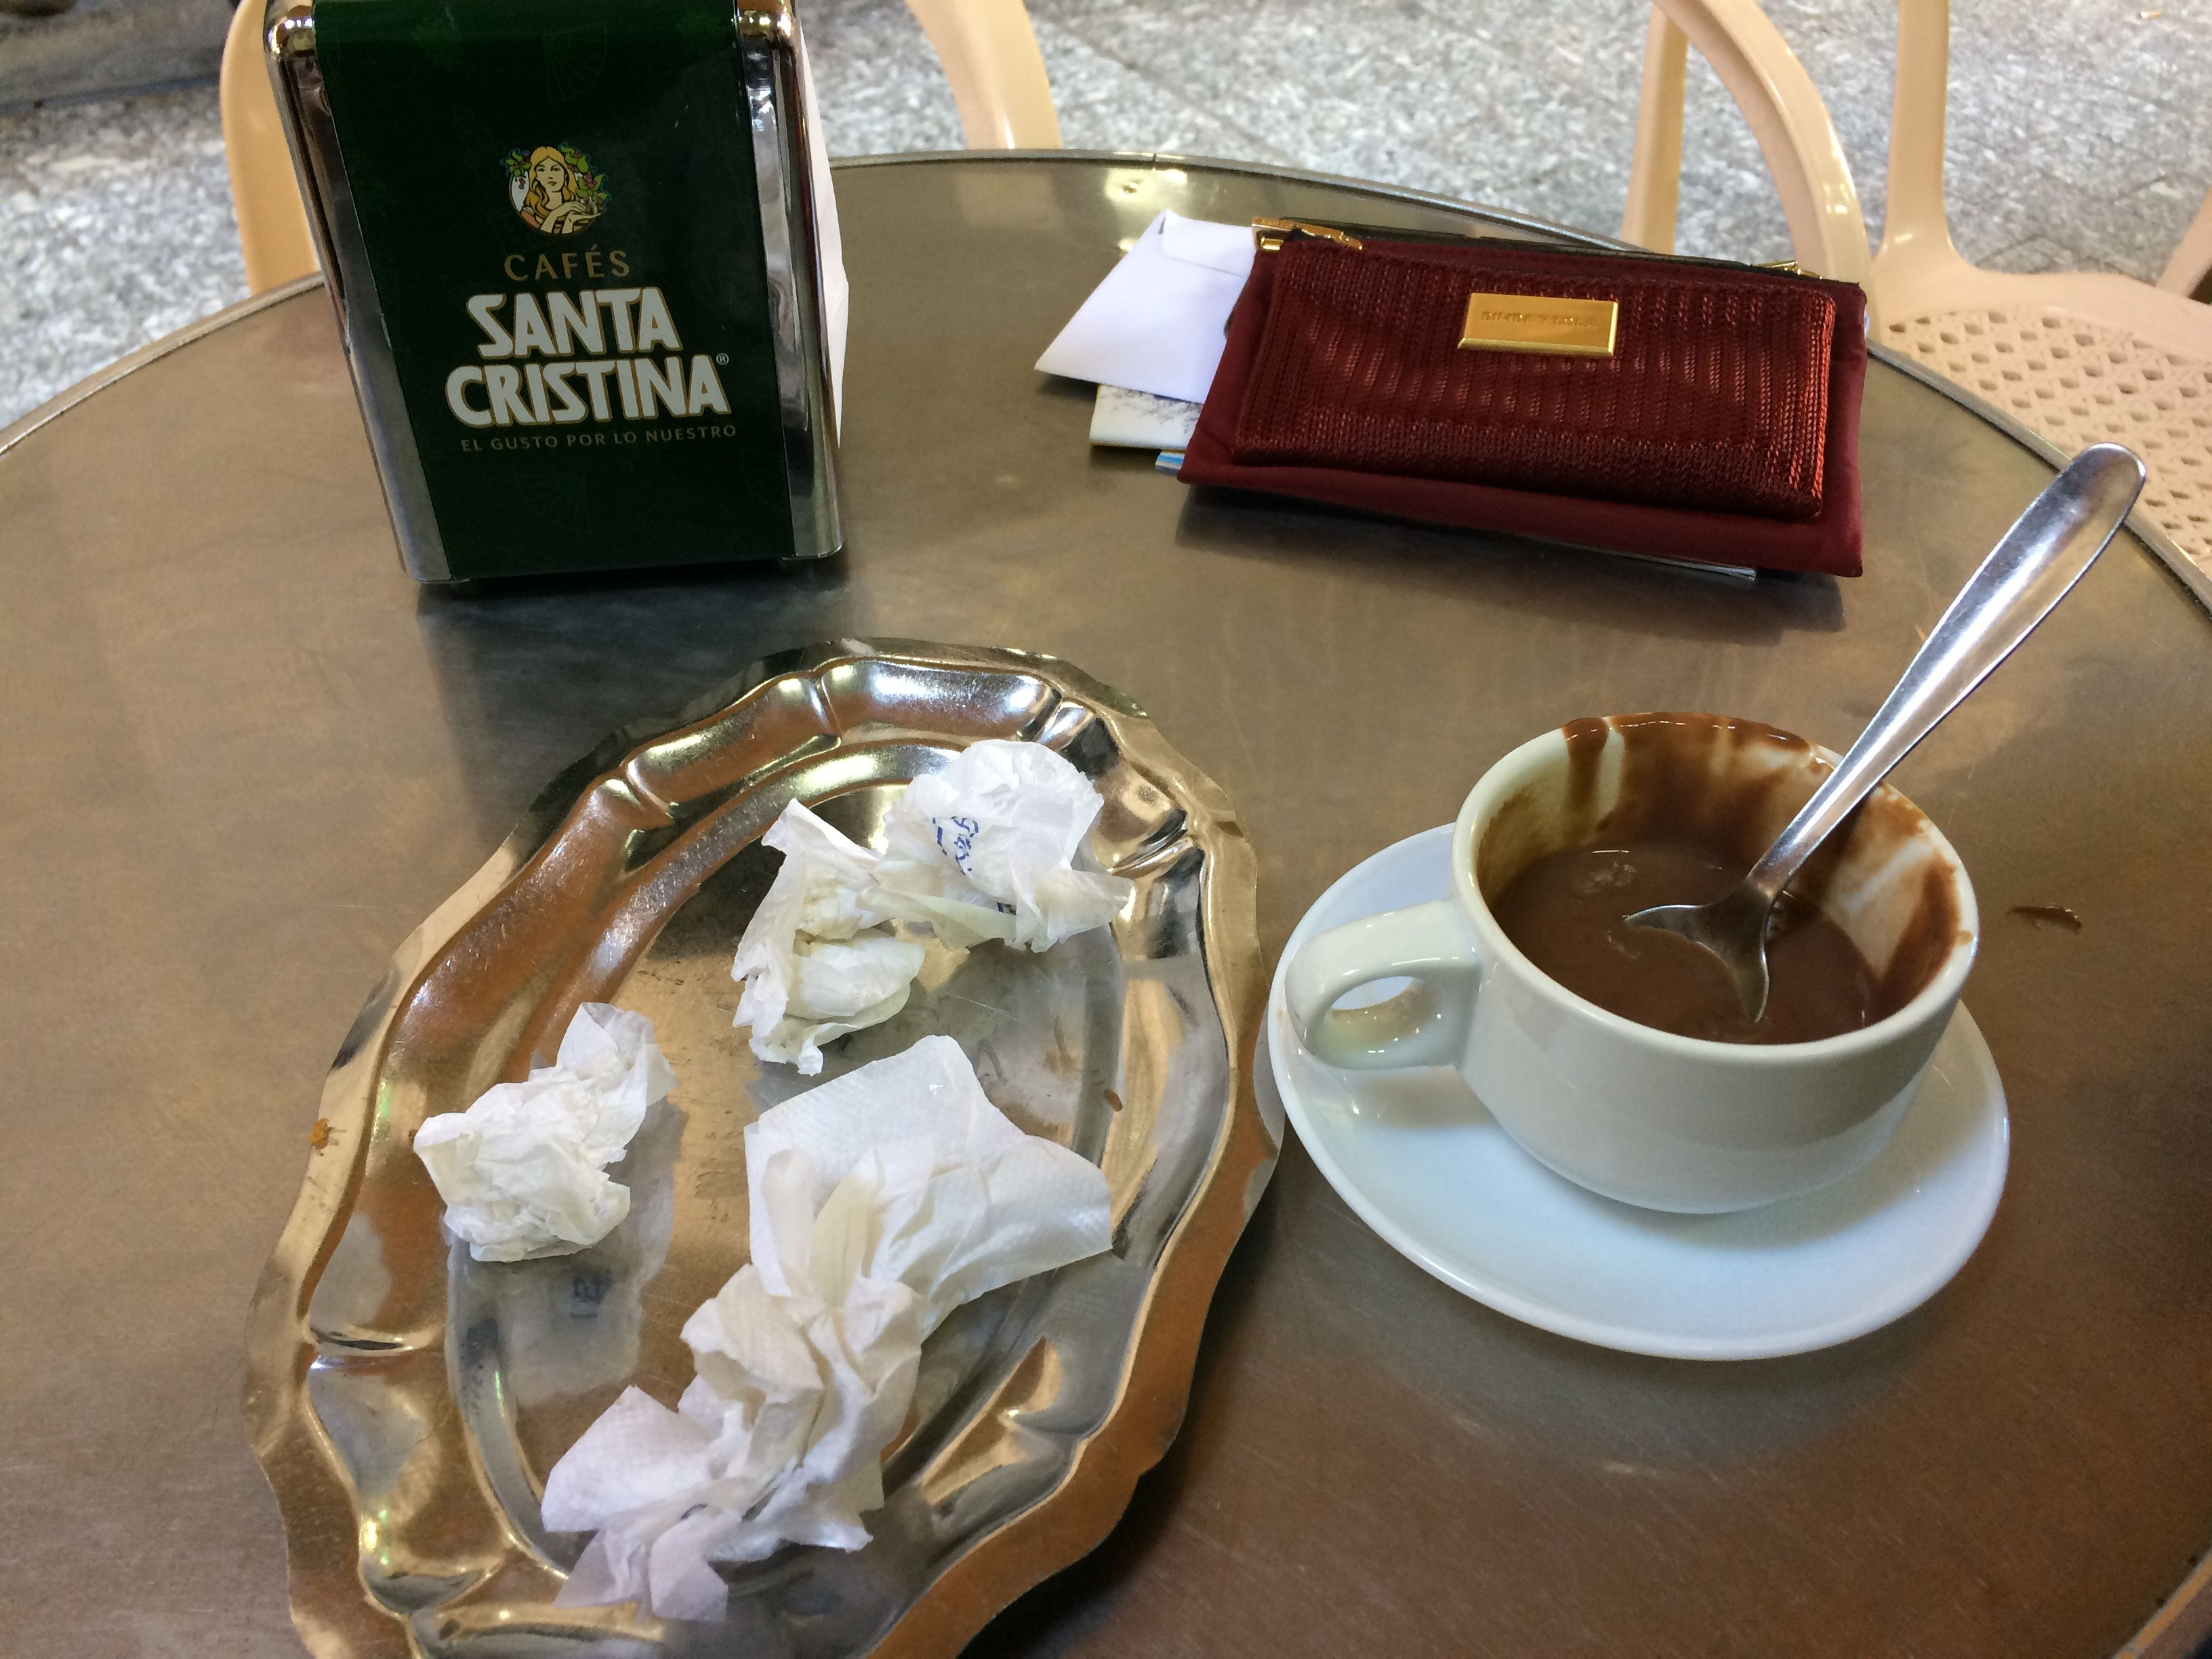 Il ne reste plus de Churros! Casa Aranda, Malaga, Espagne